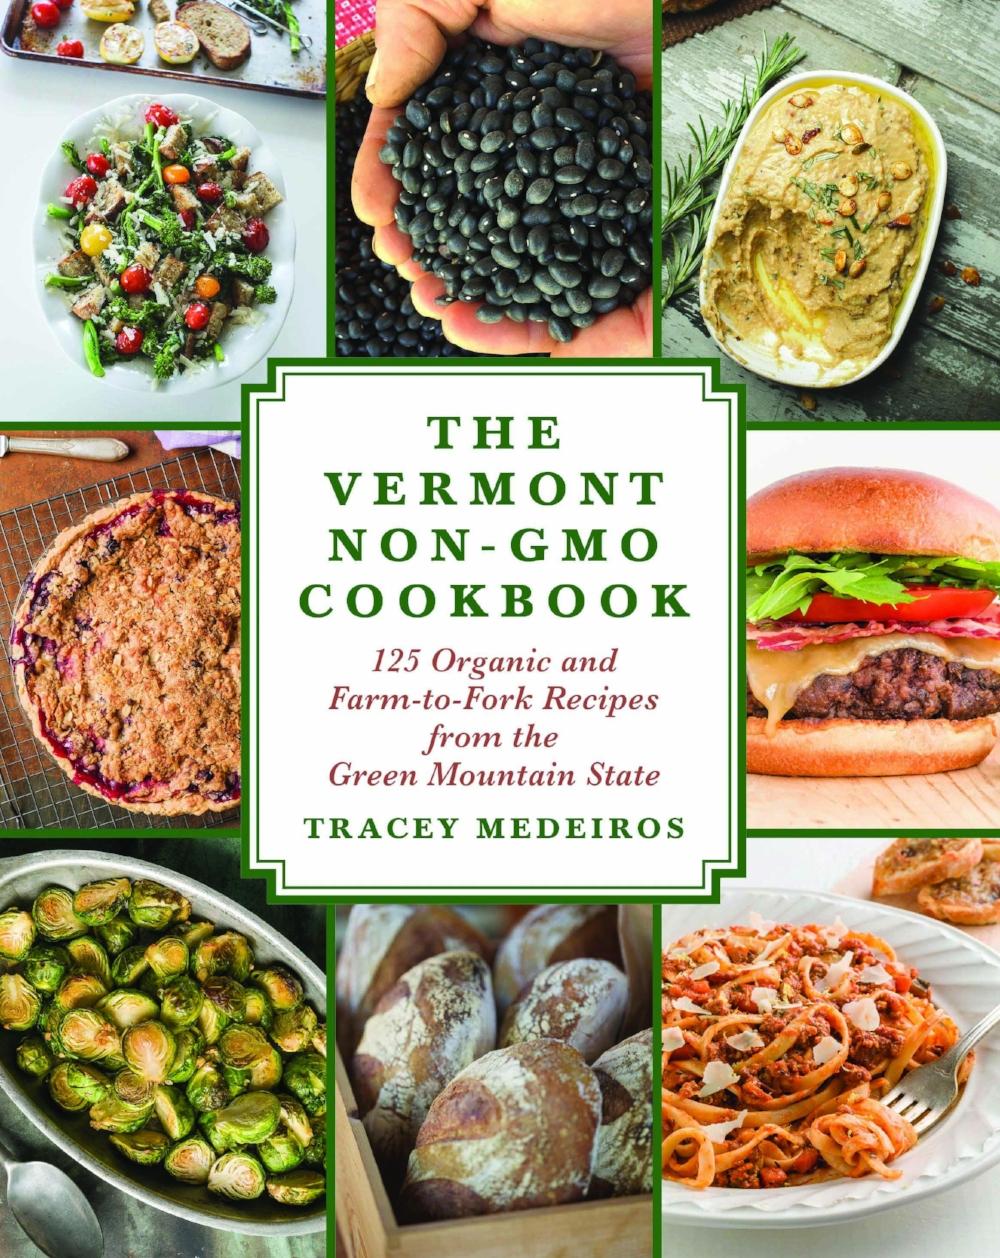 Vermont Non-GMO Cookbook_Front Cover jpeg.jpg